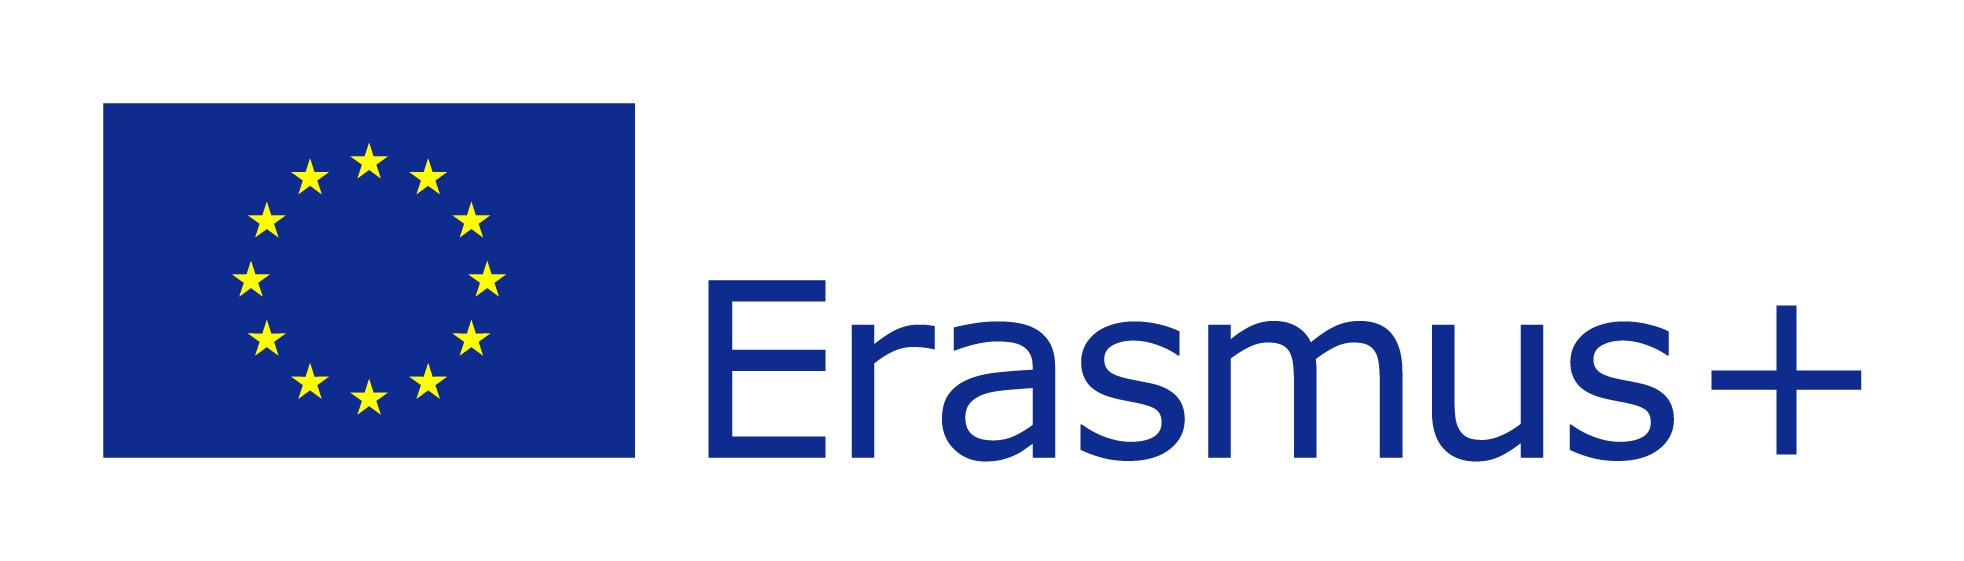 Erasmus - Venice International University